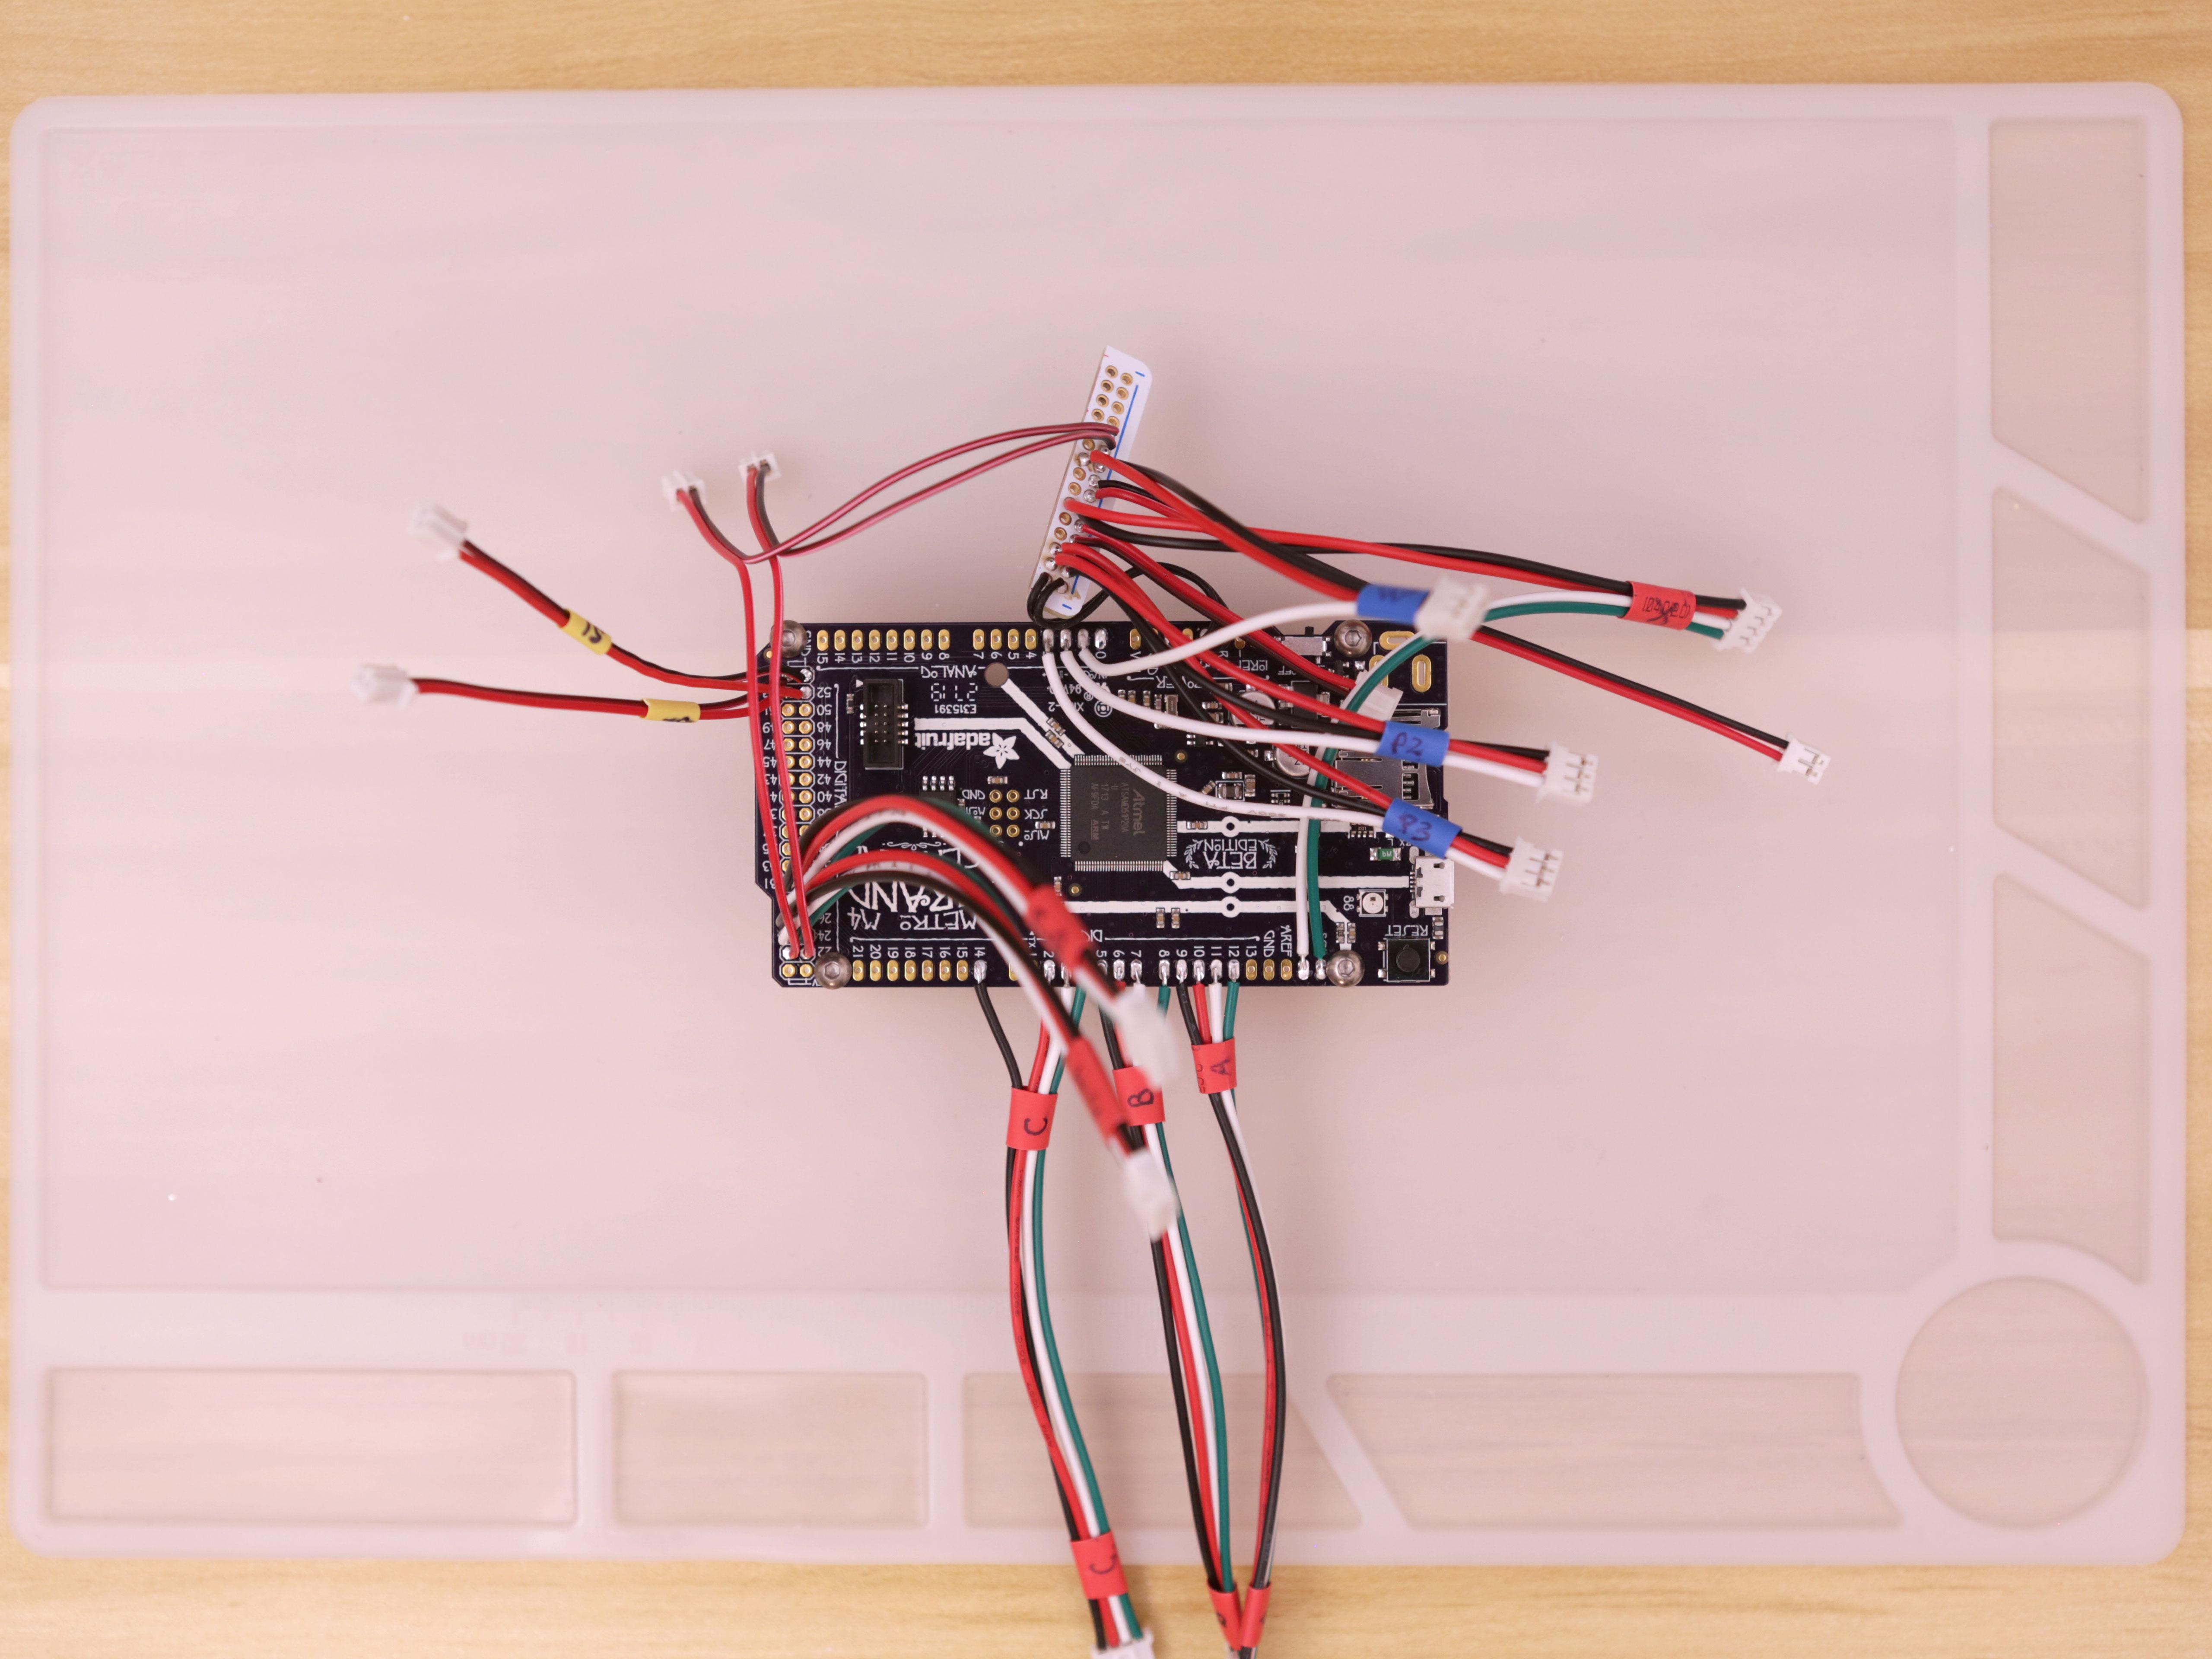 3d_printing_m4-comps-unplug.jpg